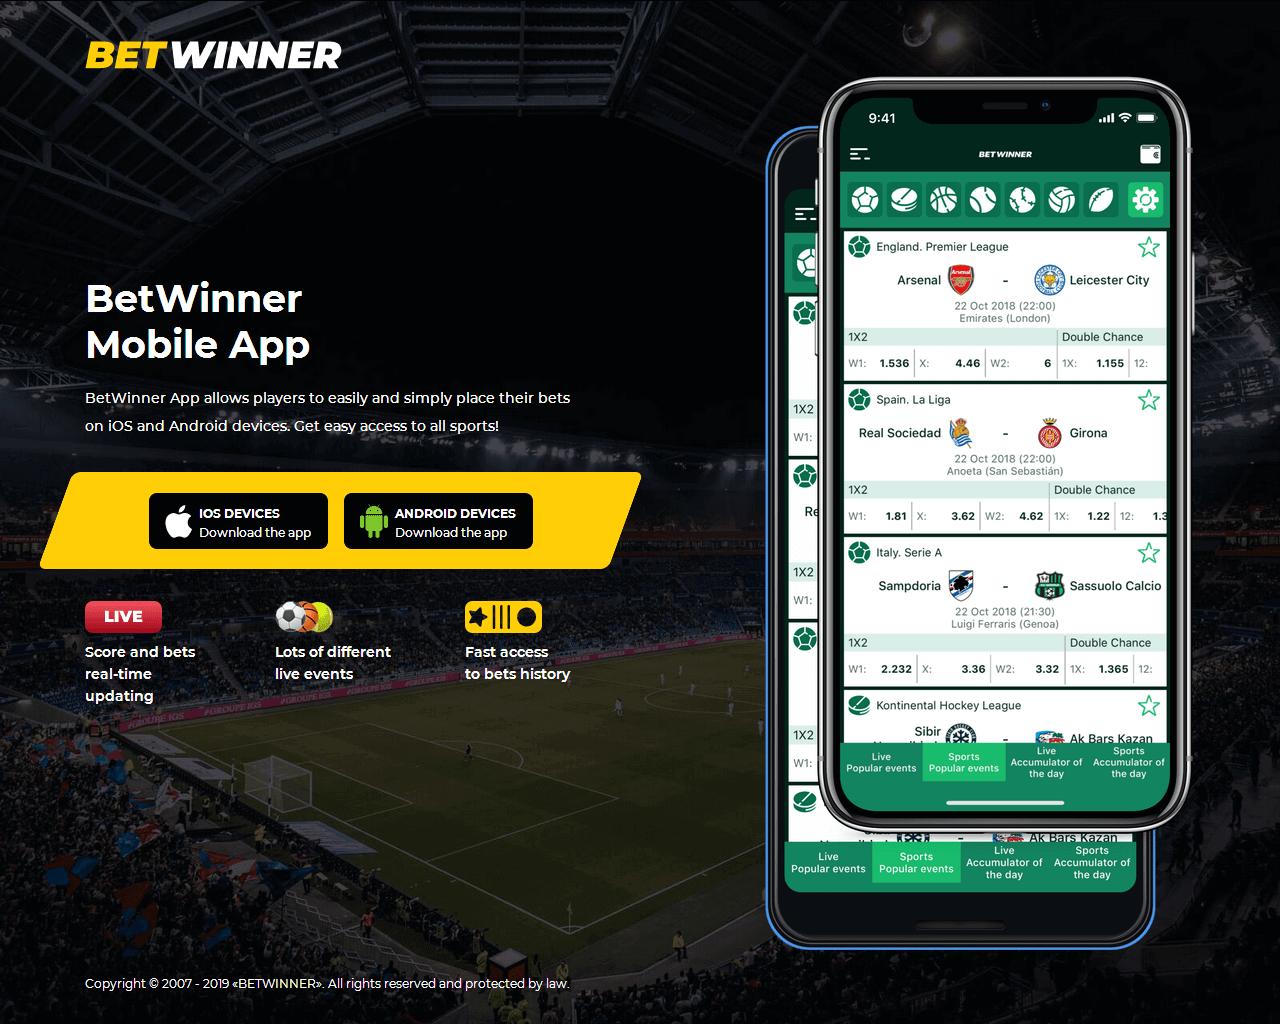 betwinner apps